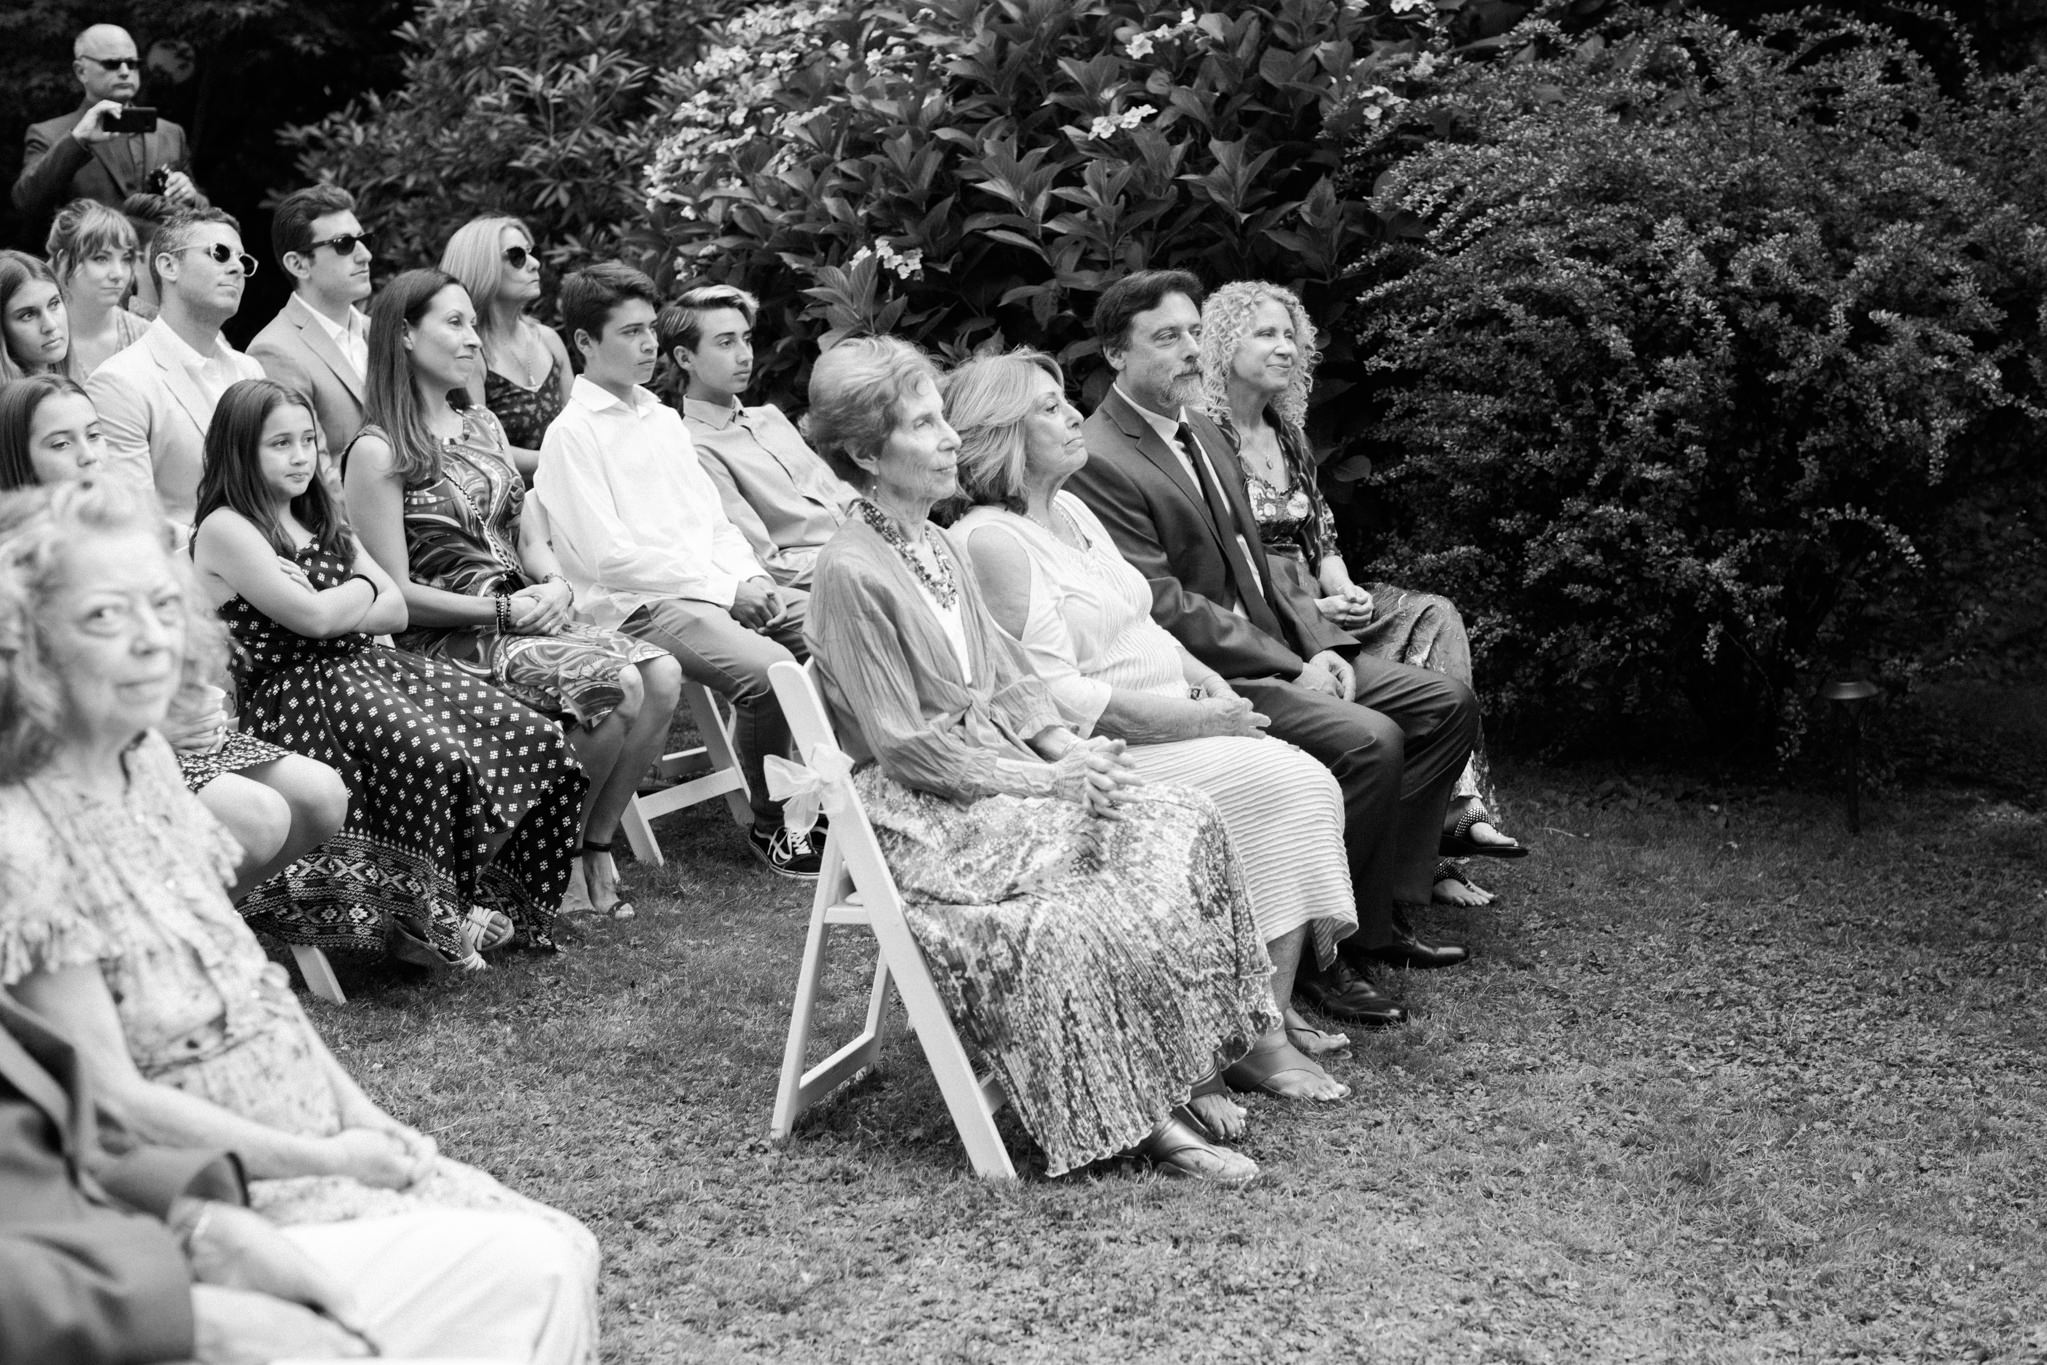 Backyard-Bainbridge-Island-Wedding-Alycia-Lovell-Photography-100.JPG